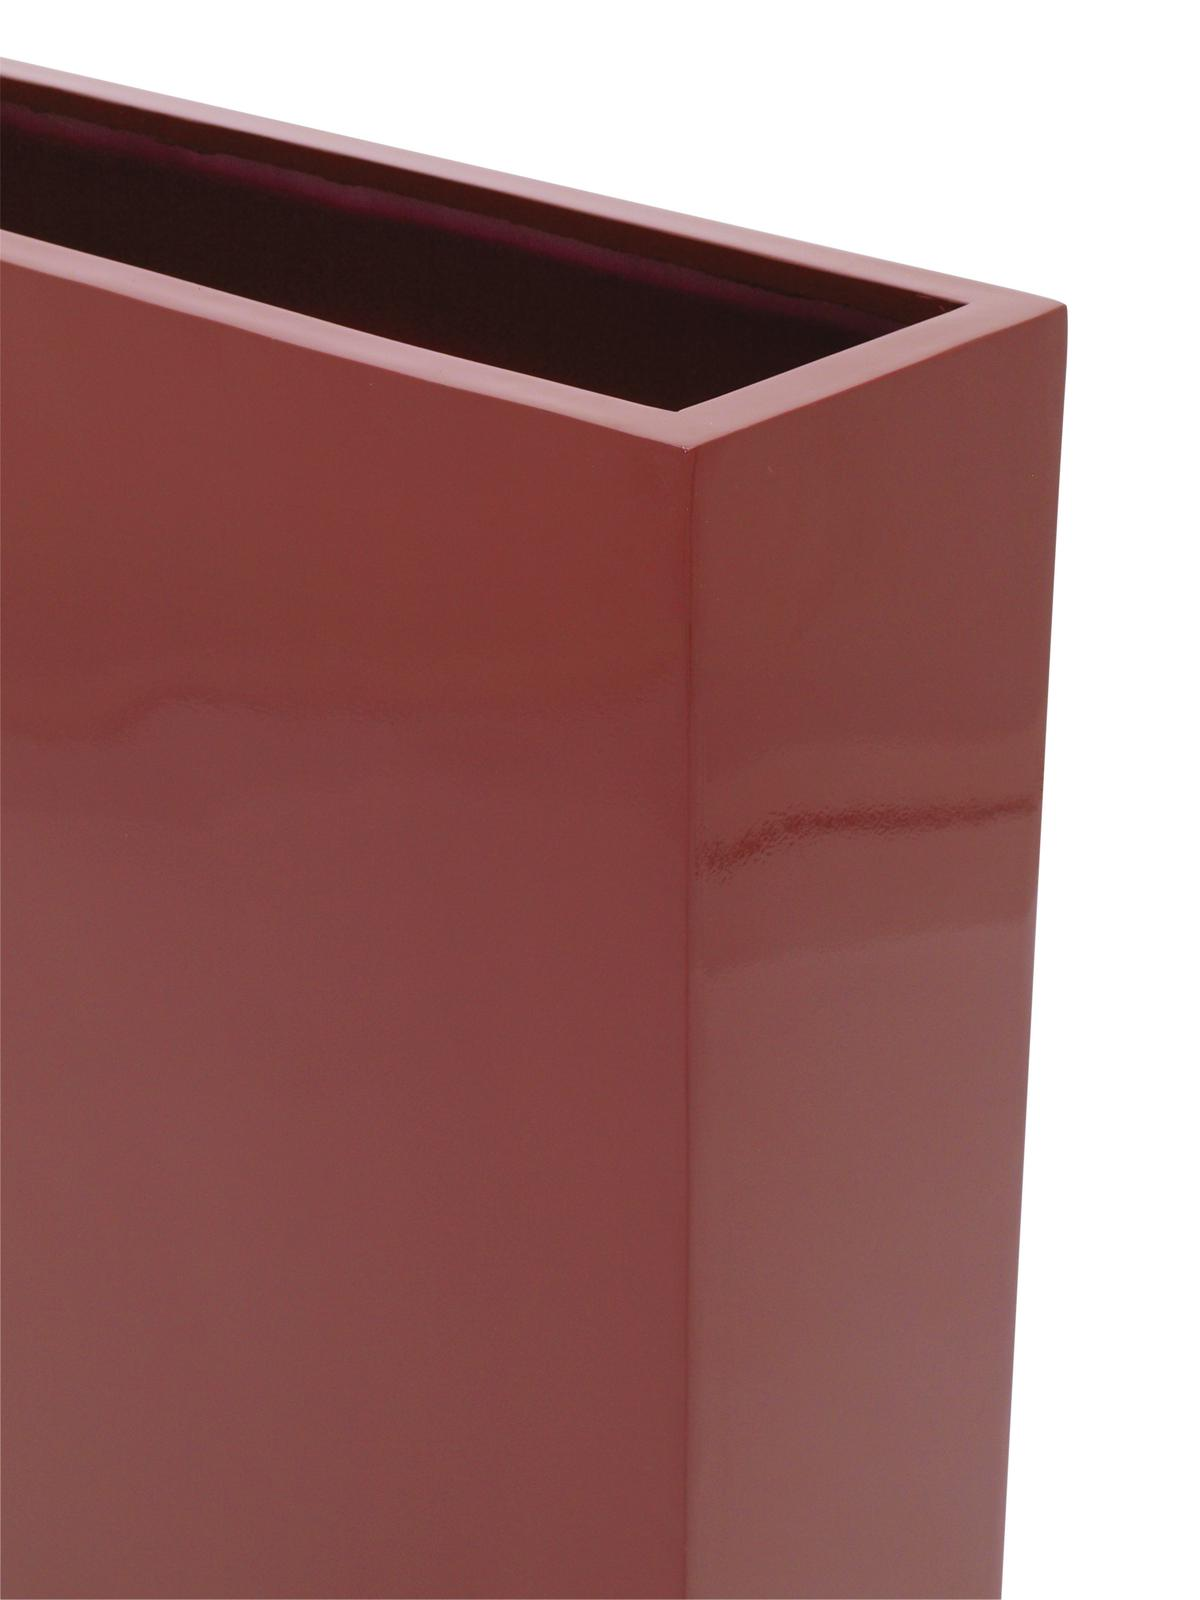 EUROPALMS LEICHTSIN CUBO-100, lucido-rosso